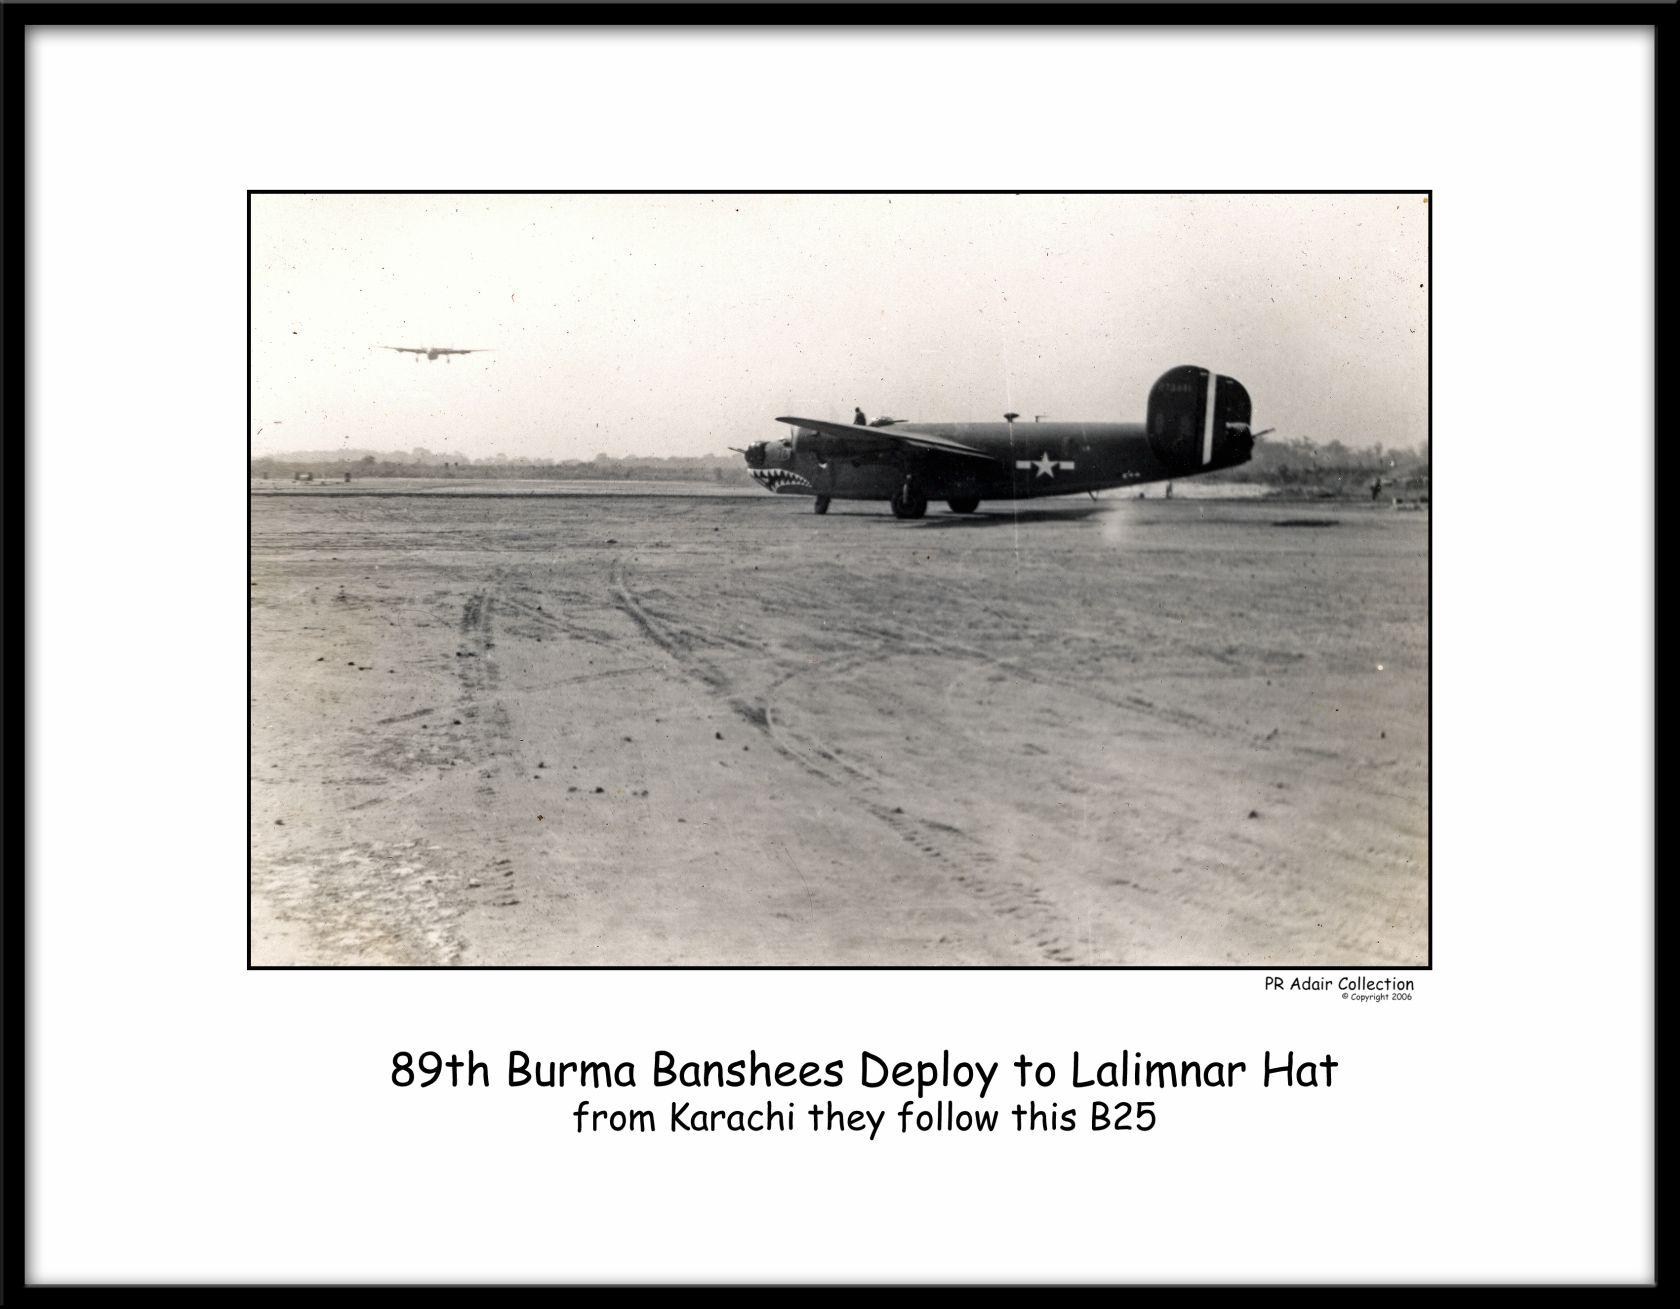 Burma Banshee 093